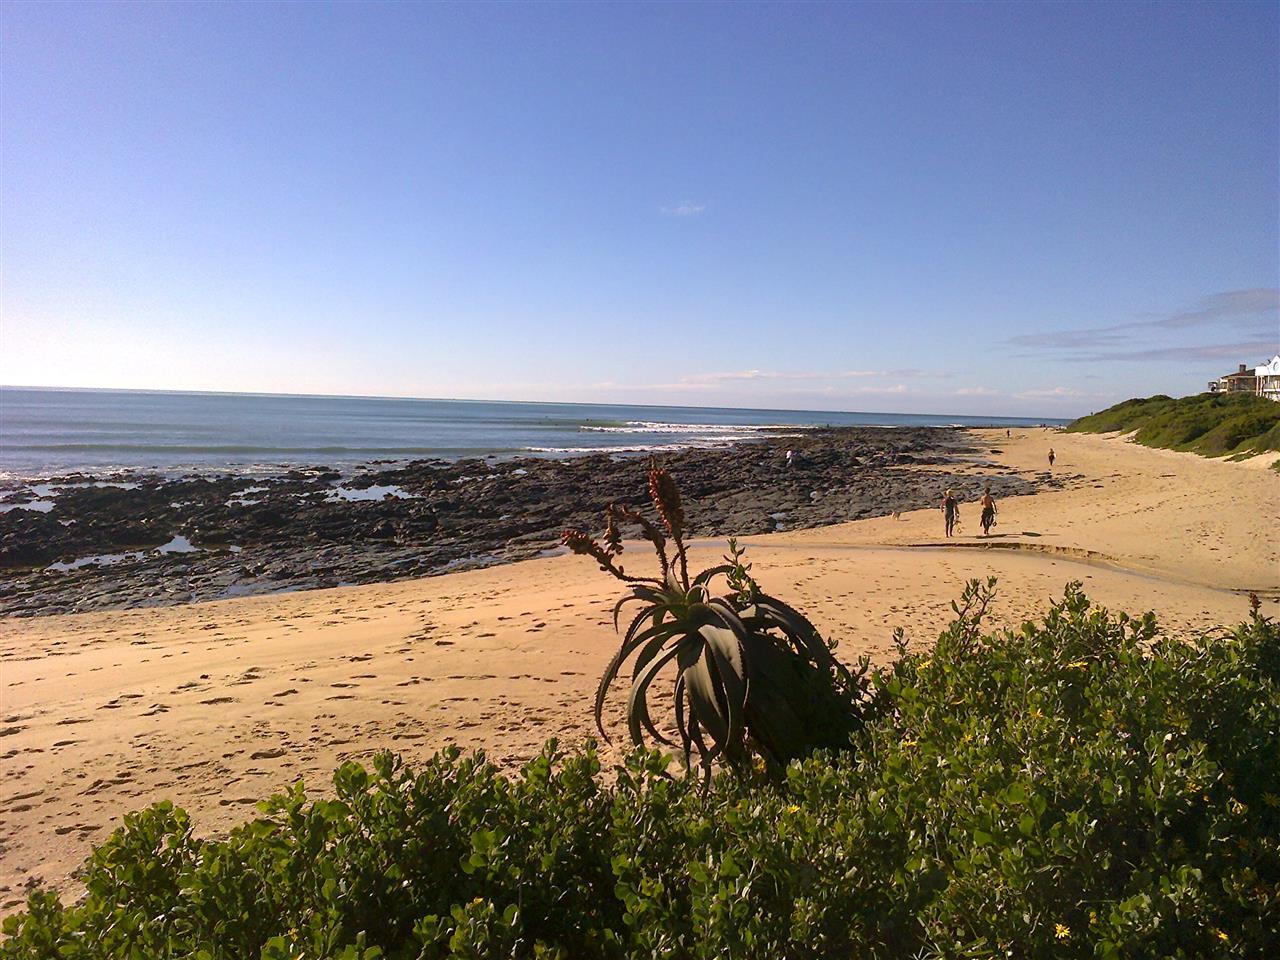 Supertubes - Jeffreys Bay, South Africa